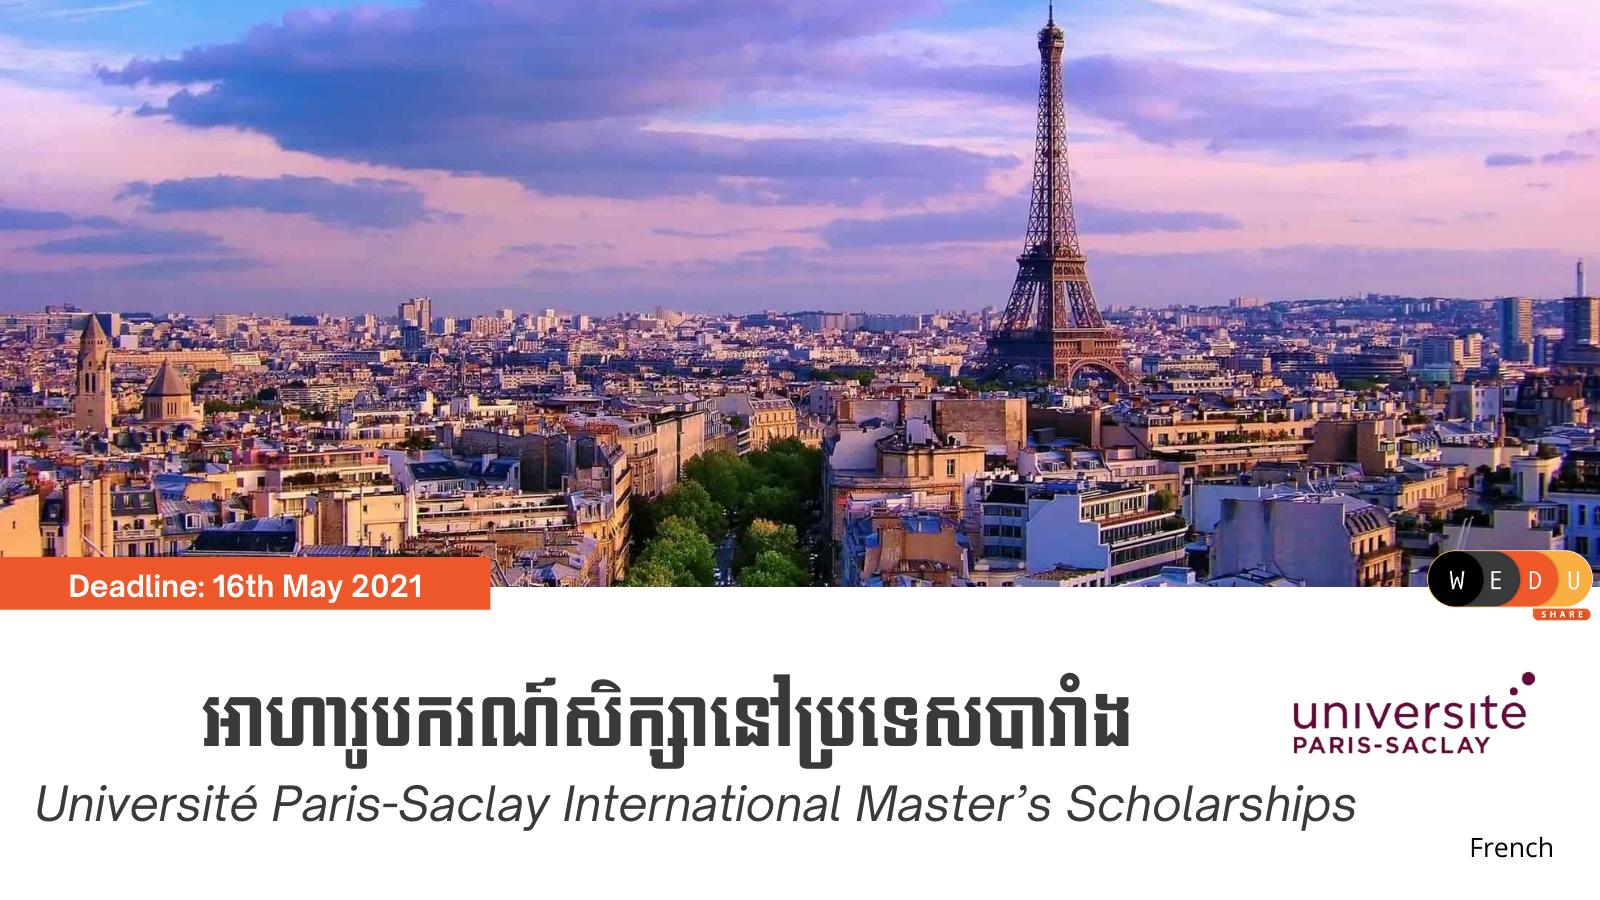 Université Paris-Saclay International Master's Scholarships